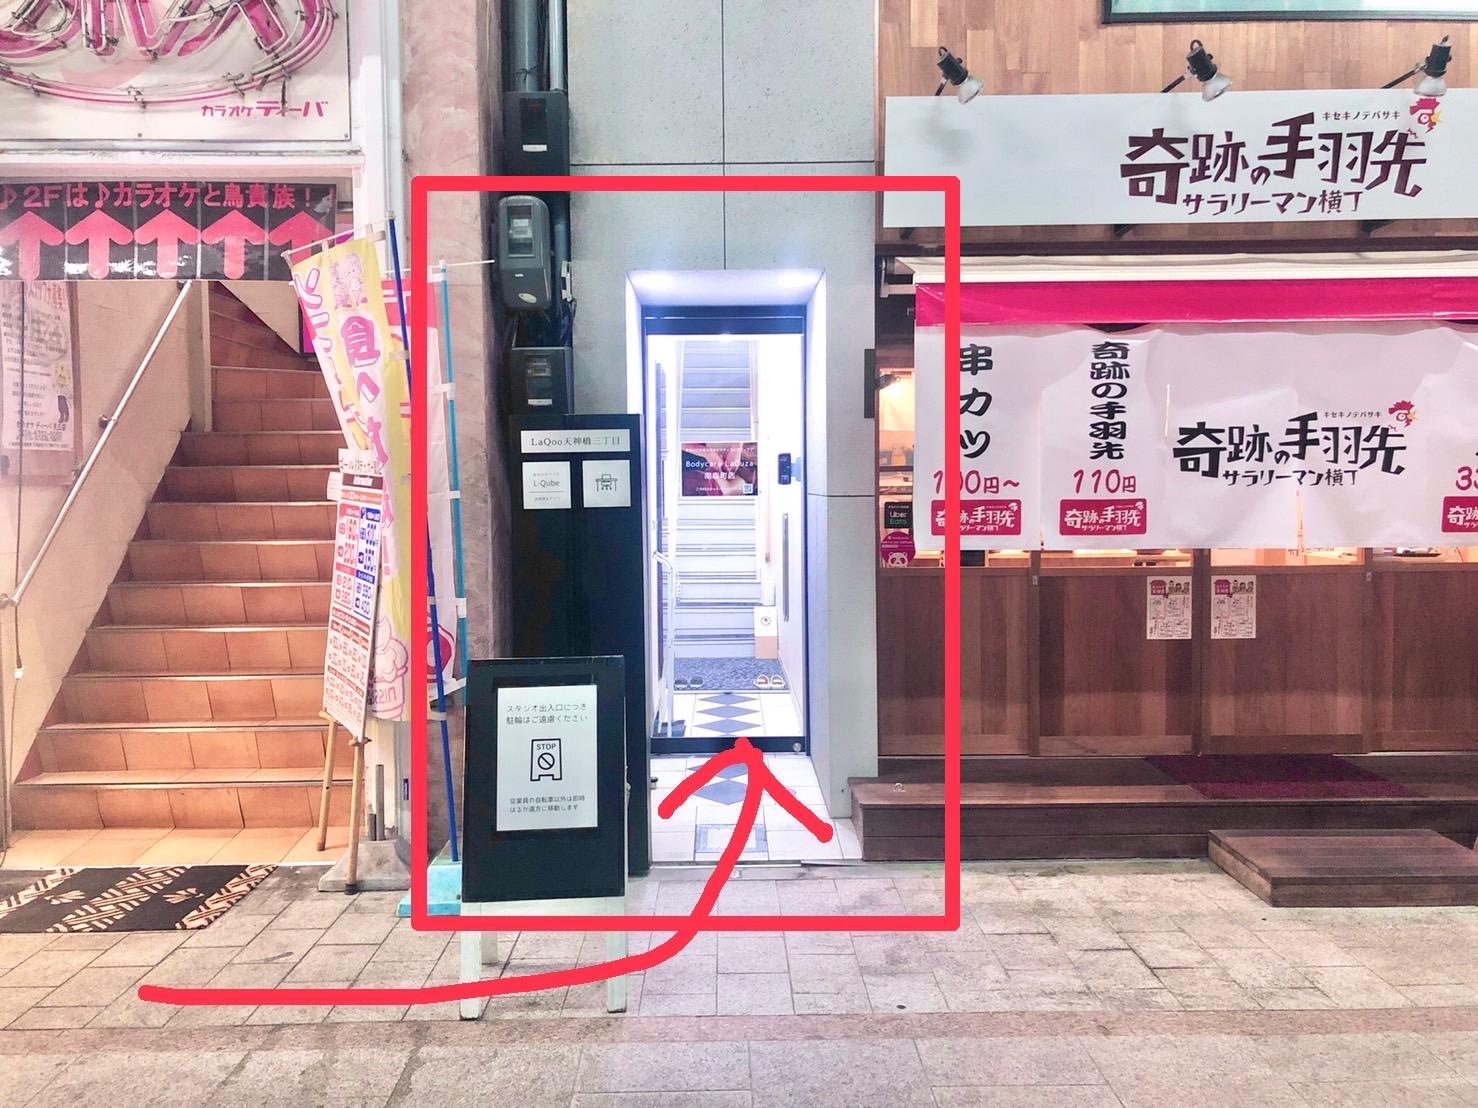 LaQoo天神橋のシェアサロン・レンタルサロン・レンタルヨガスタジオの入口まで、南森町駅から徒歩4分、大阪駅から車で約10分です。